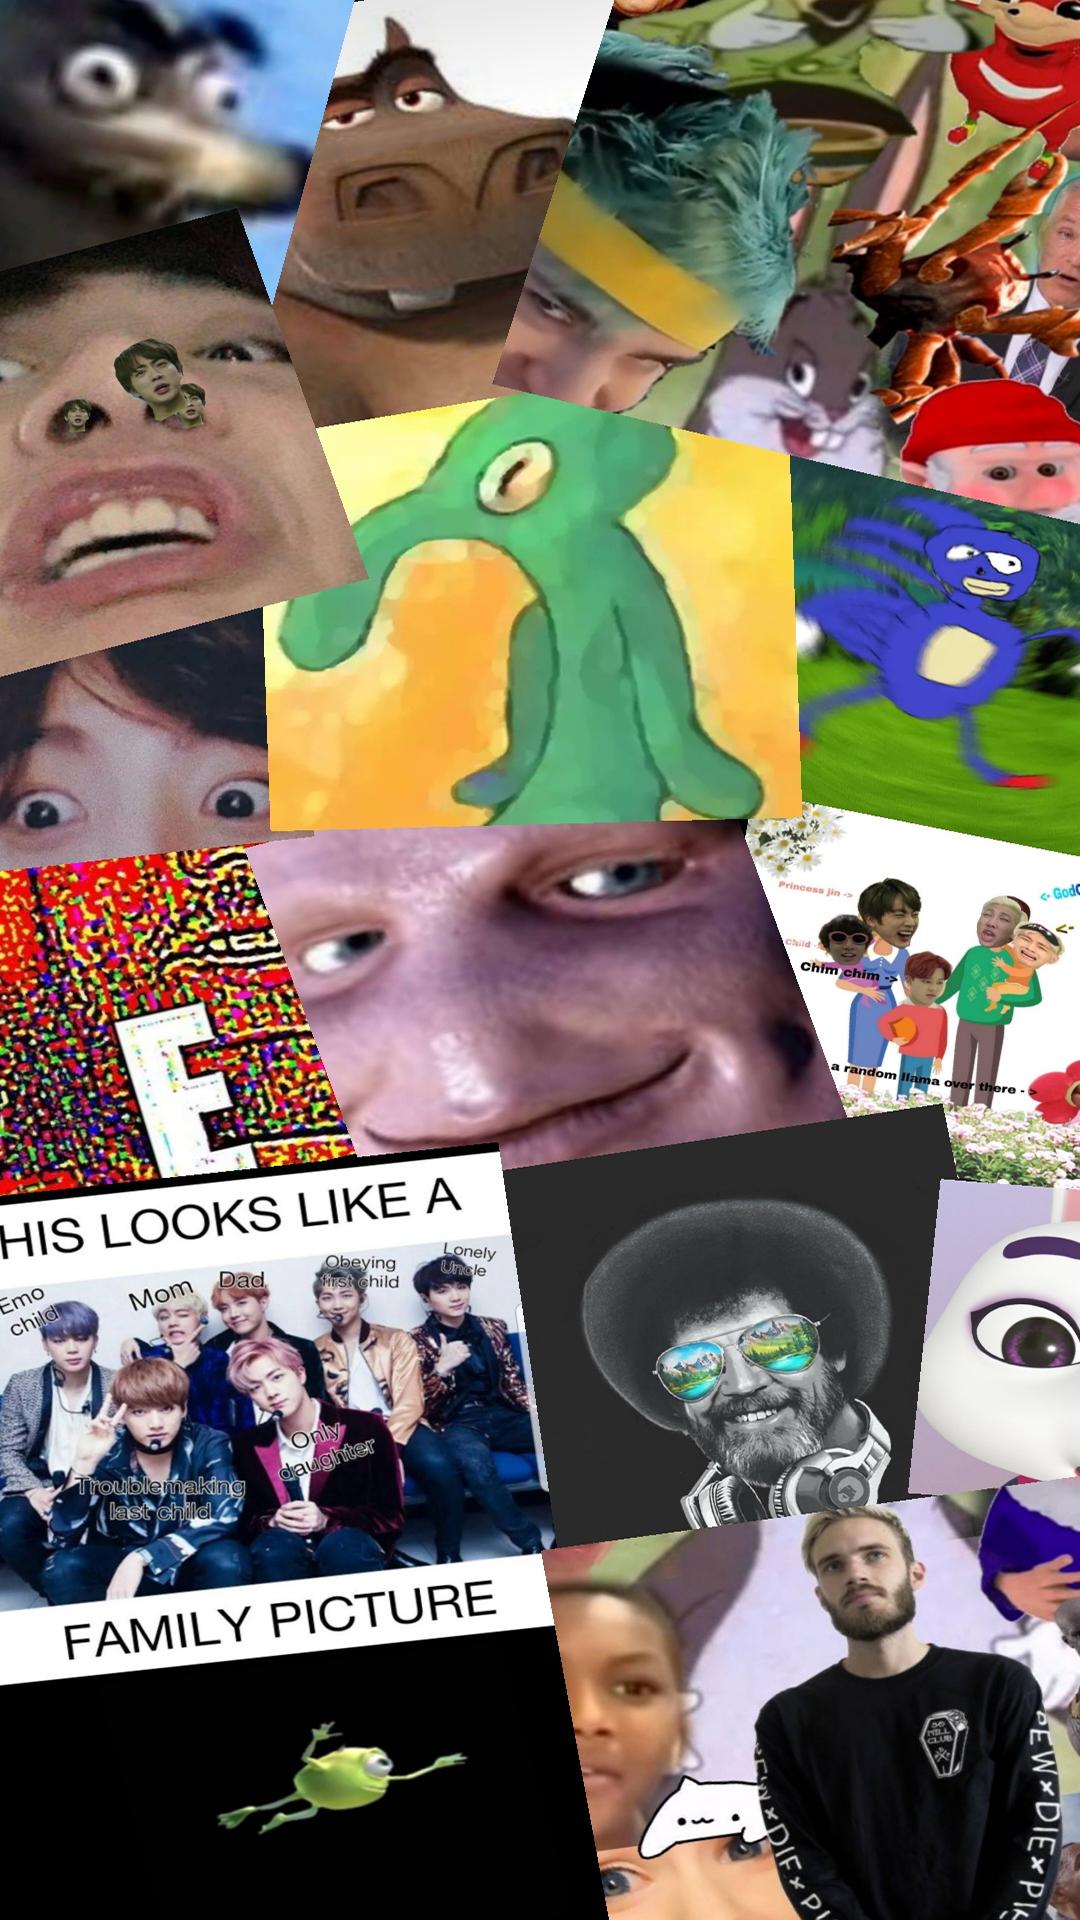 Funny Memes Full HD Wallpapers for Mobile